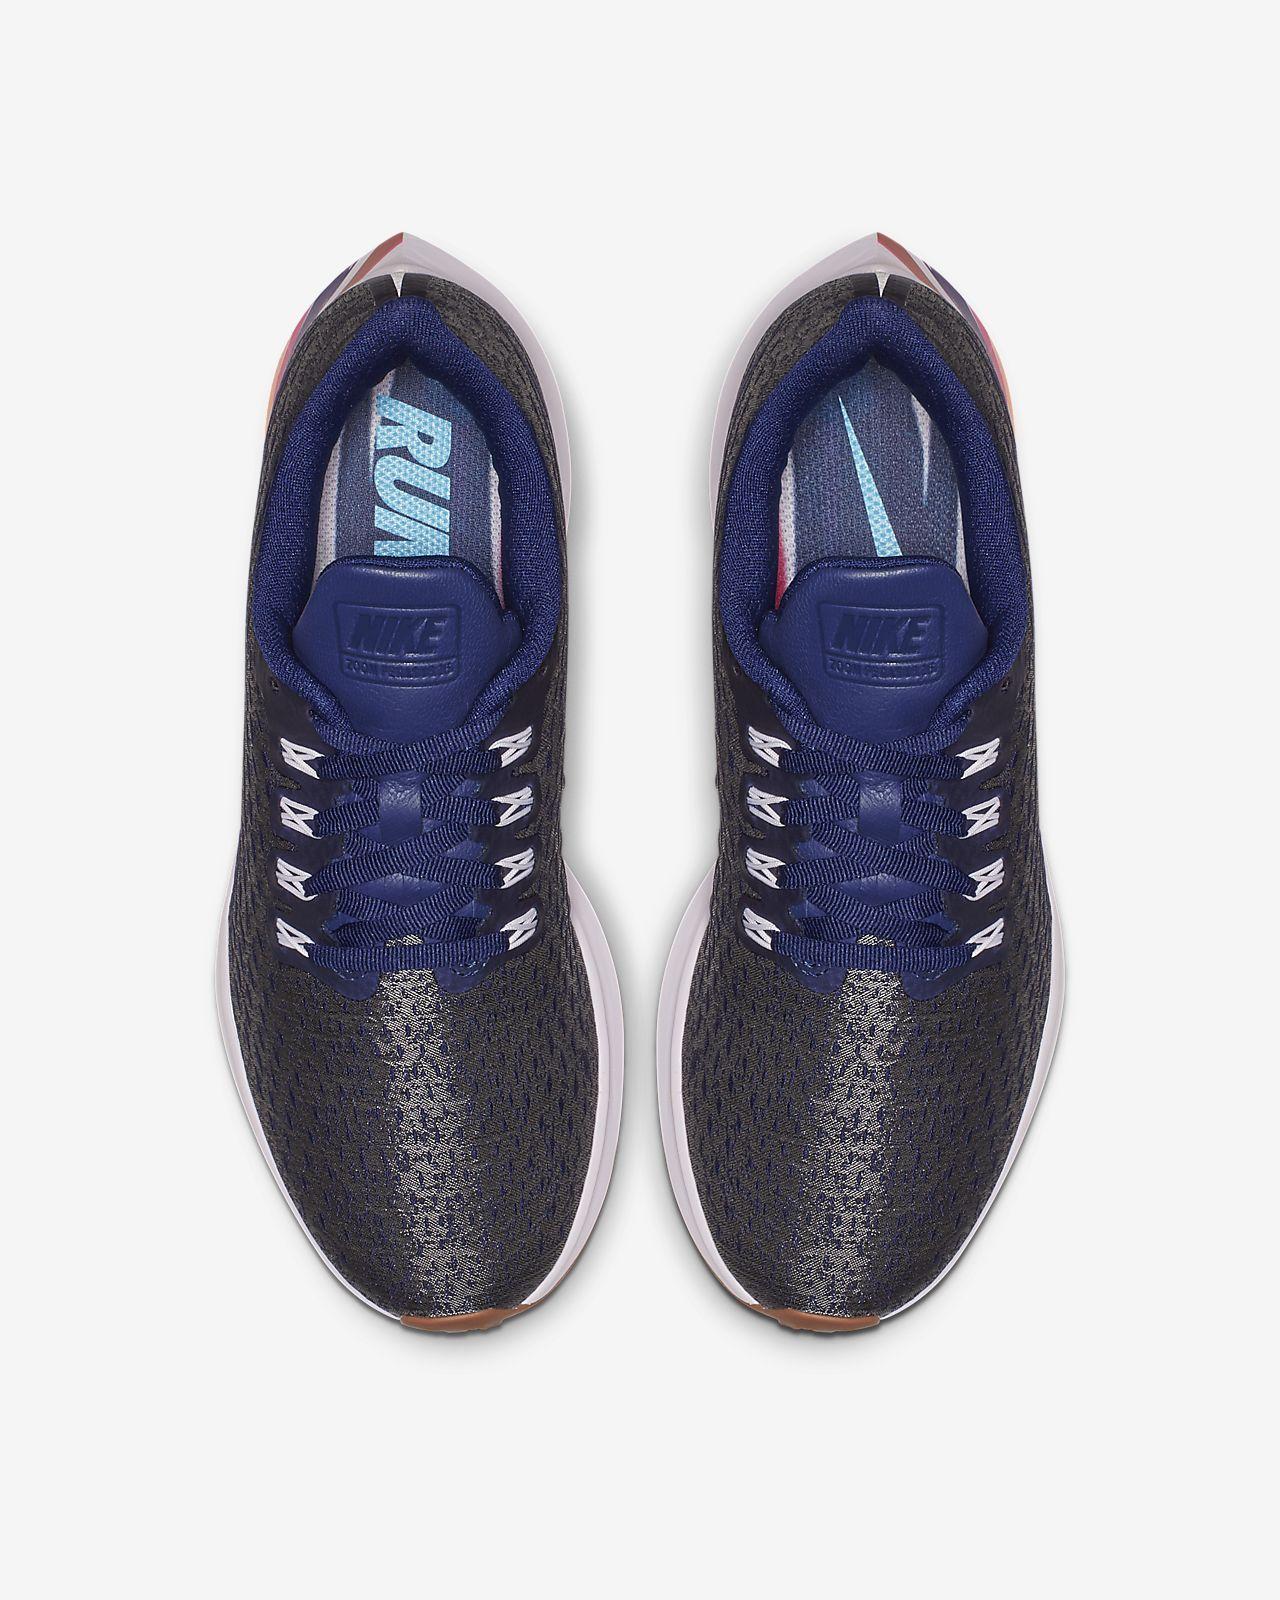 58d9b71a388d Nike Air Zoom Pegasus 35 Premium Women s Running Shoe. Nike.com